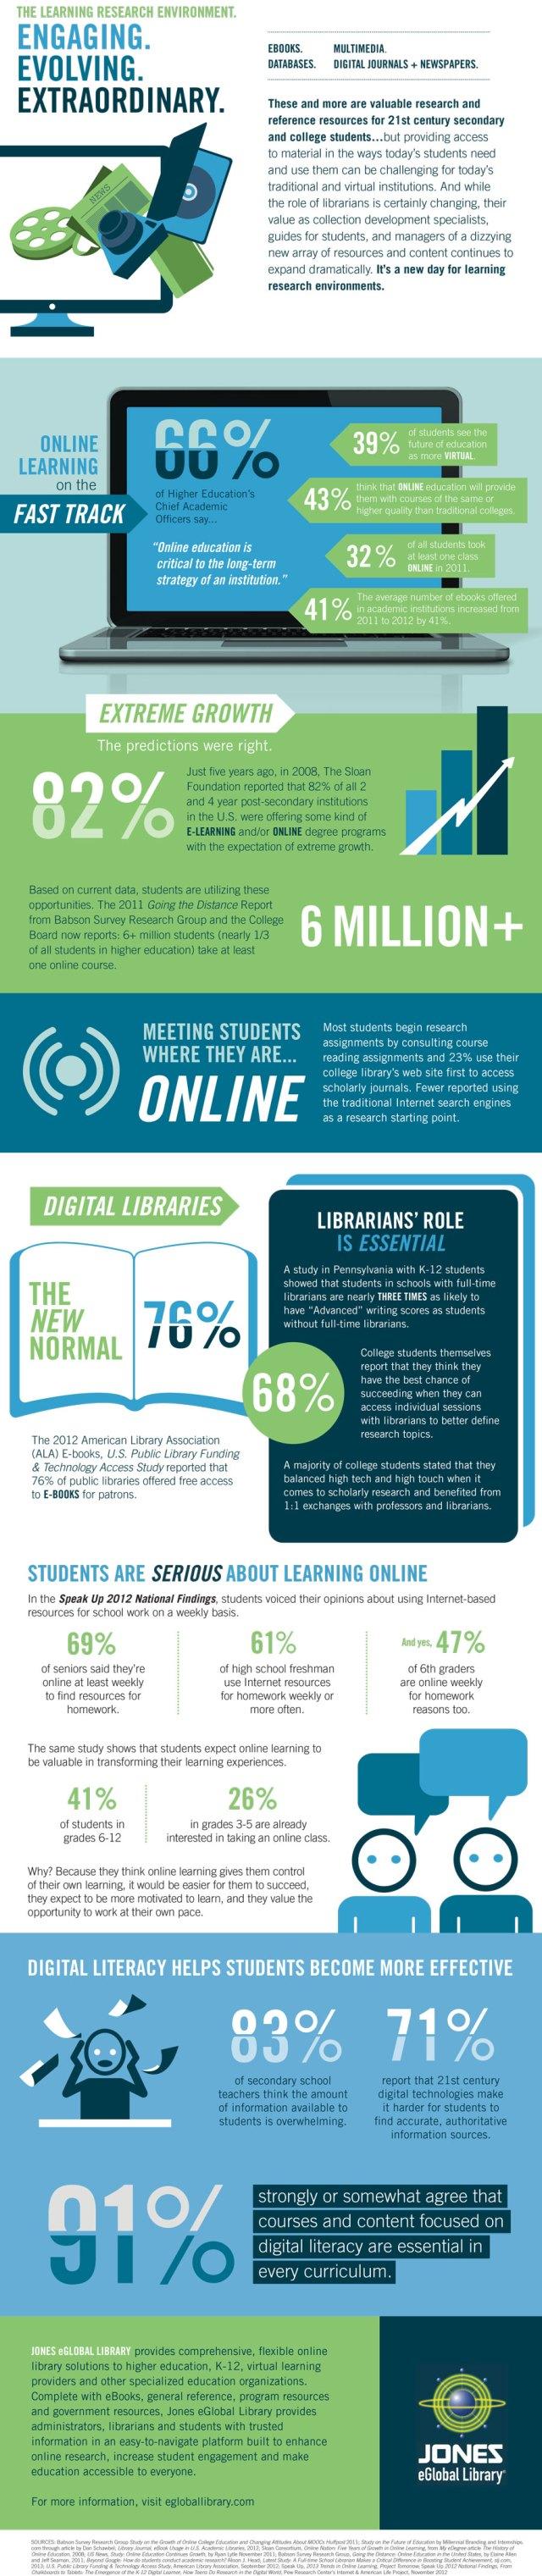 CREDIT Jones eGlobal Library